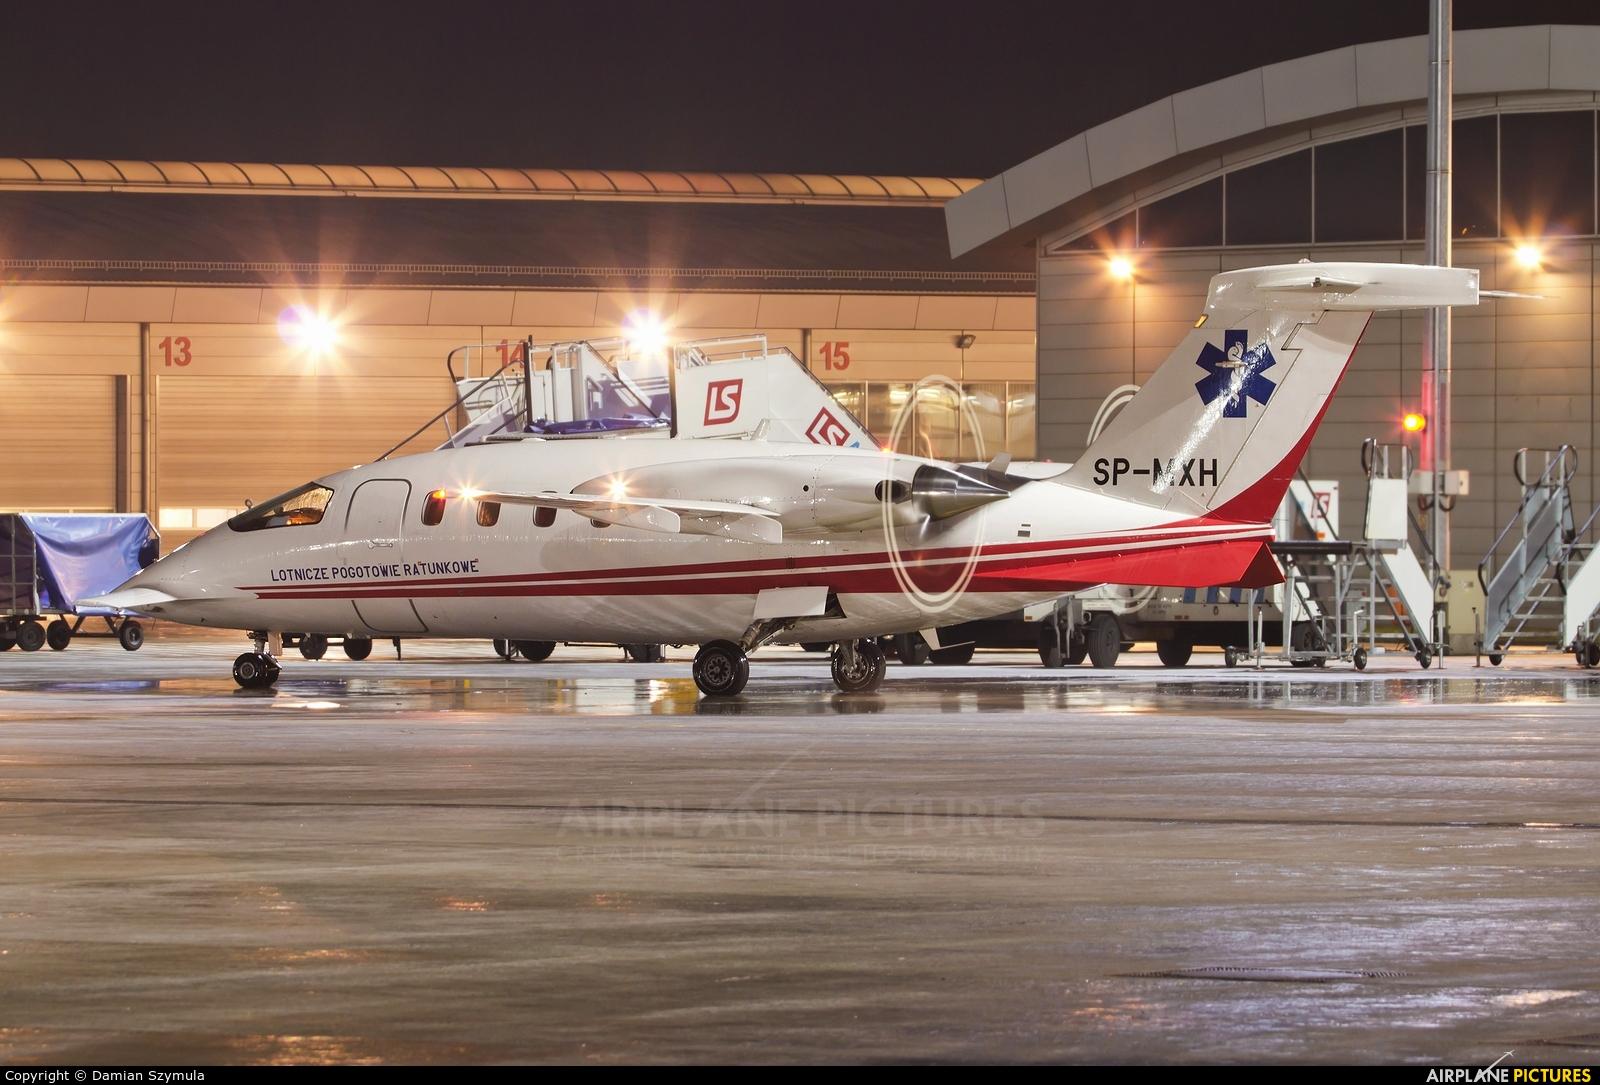 Polish Medical Air Rescue - Lotnicze Pogotowie Ratunkowe SP-MXH aircraft at Kraków - John Paul II Intl